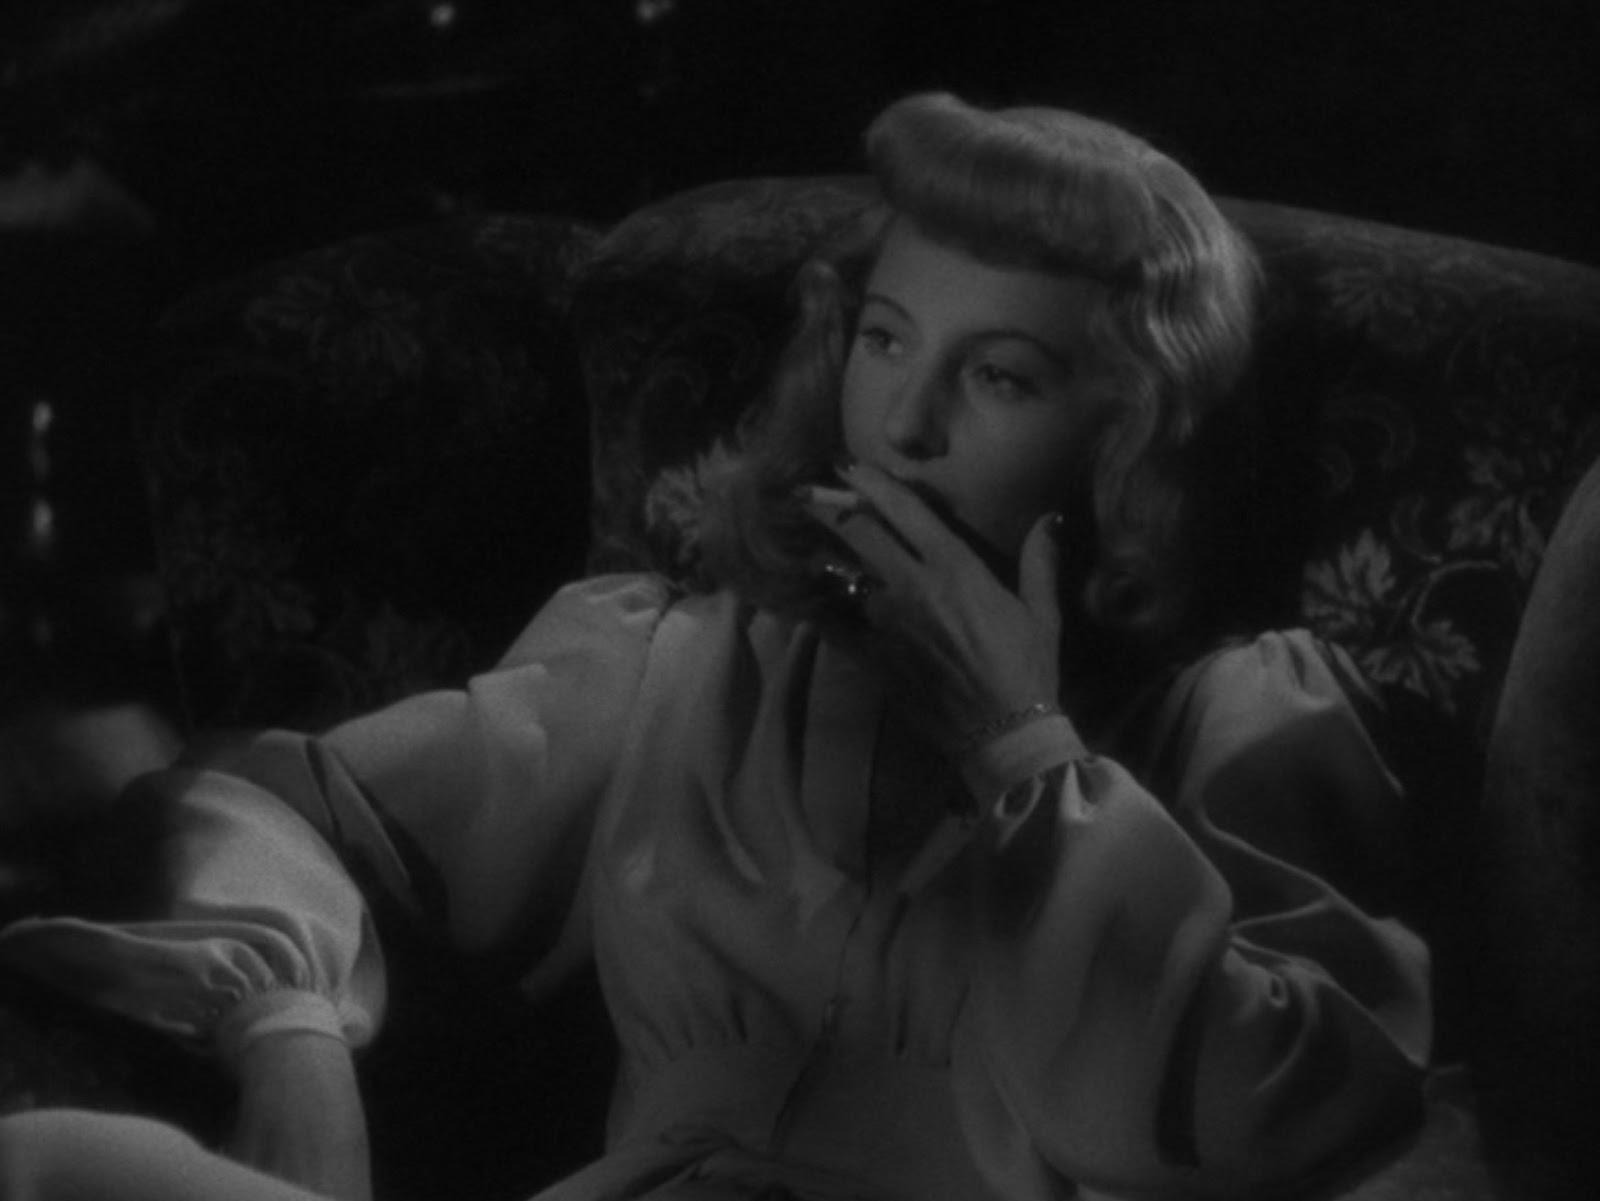 Film noir: Barbara Stanwyck - Double Indemnity (1944